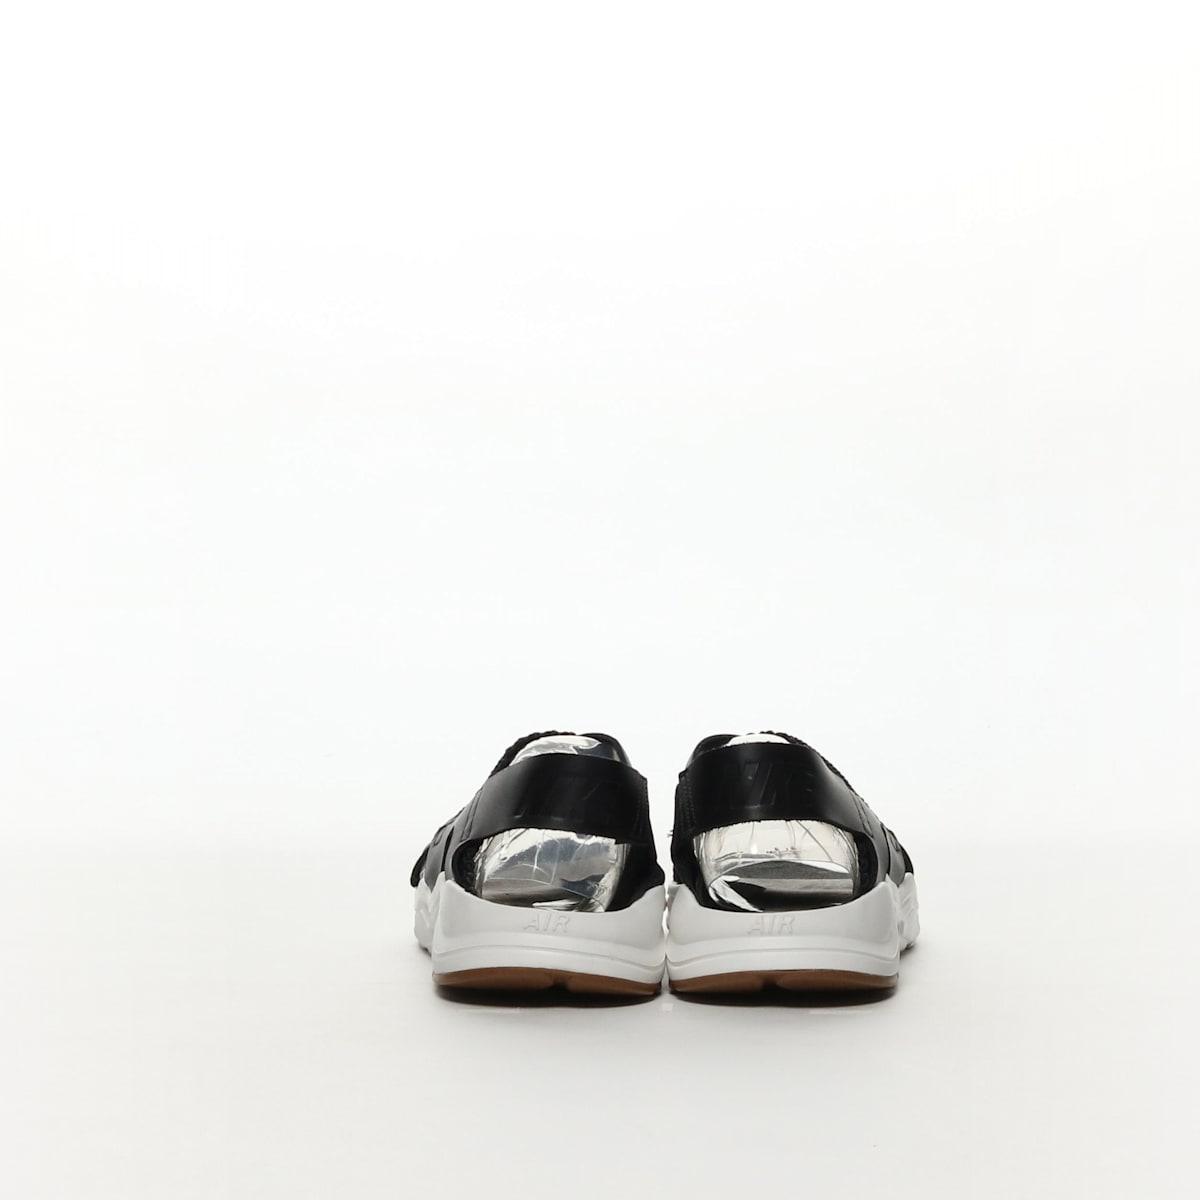 7b433aa28f95a Women s Nike Air Huarache Ultra Sandal - BLACK BLACK – Resku